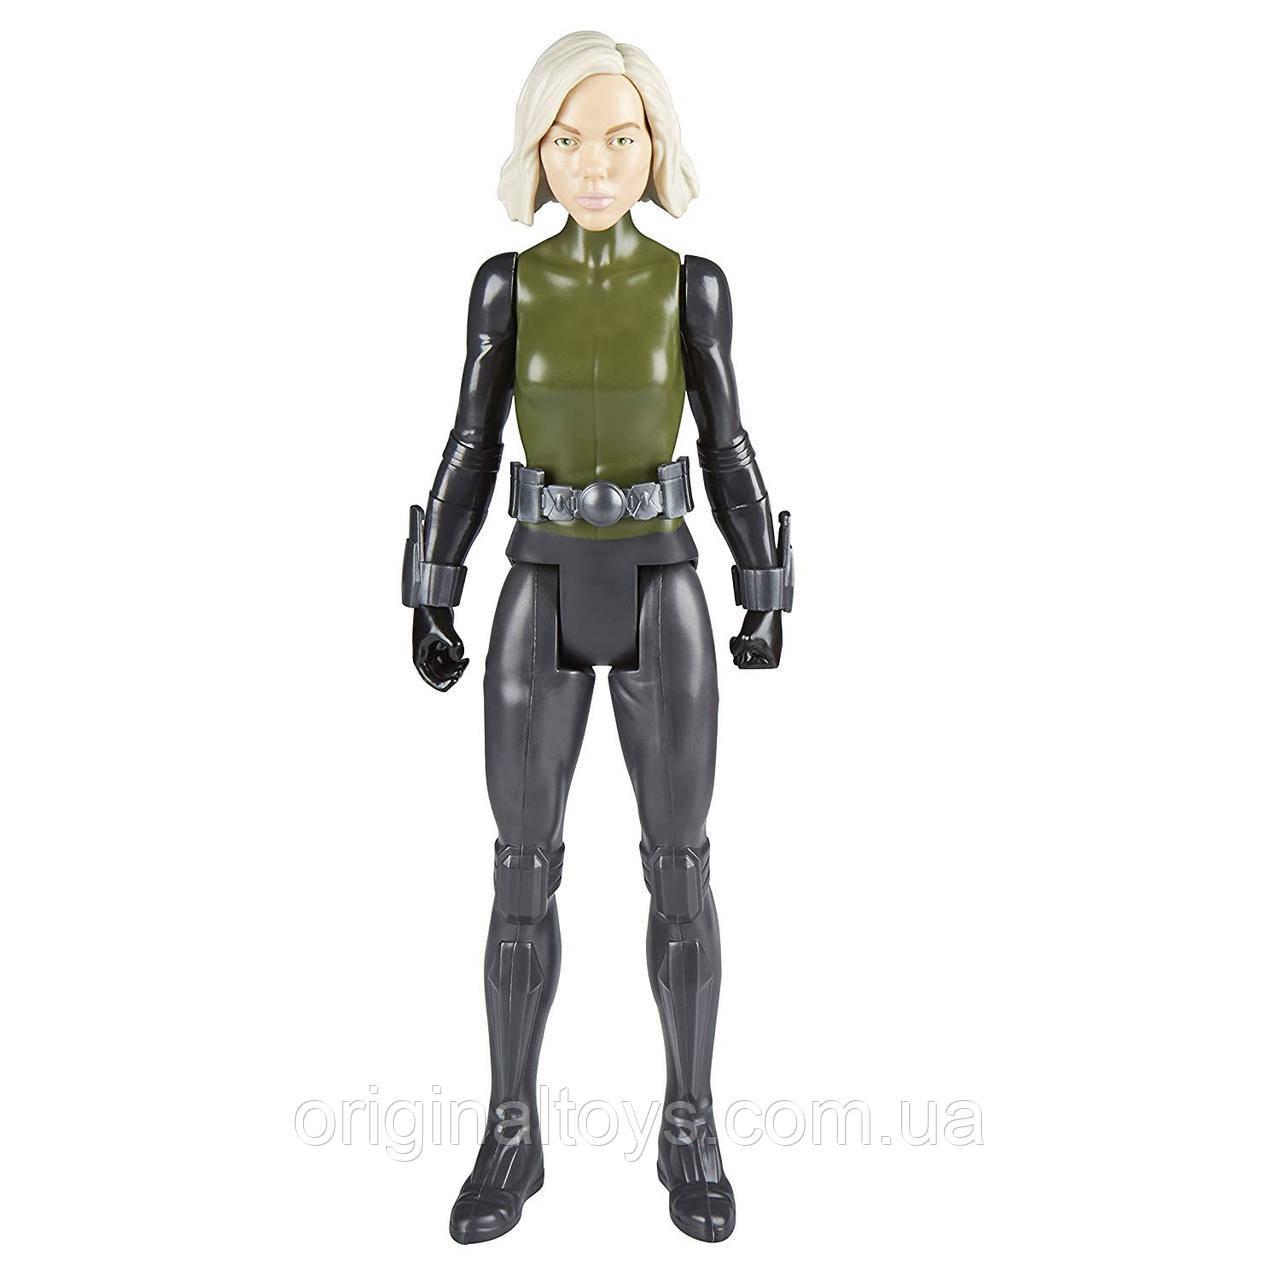 Фигурка Чёрная вдова Black Widow Marvel Infinity War Titan Hero Series Hasbro, 30 см E2217